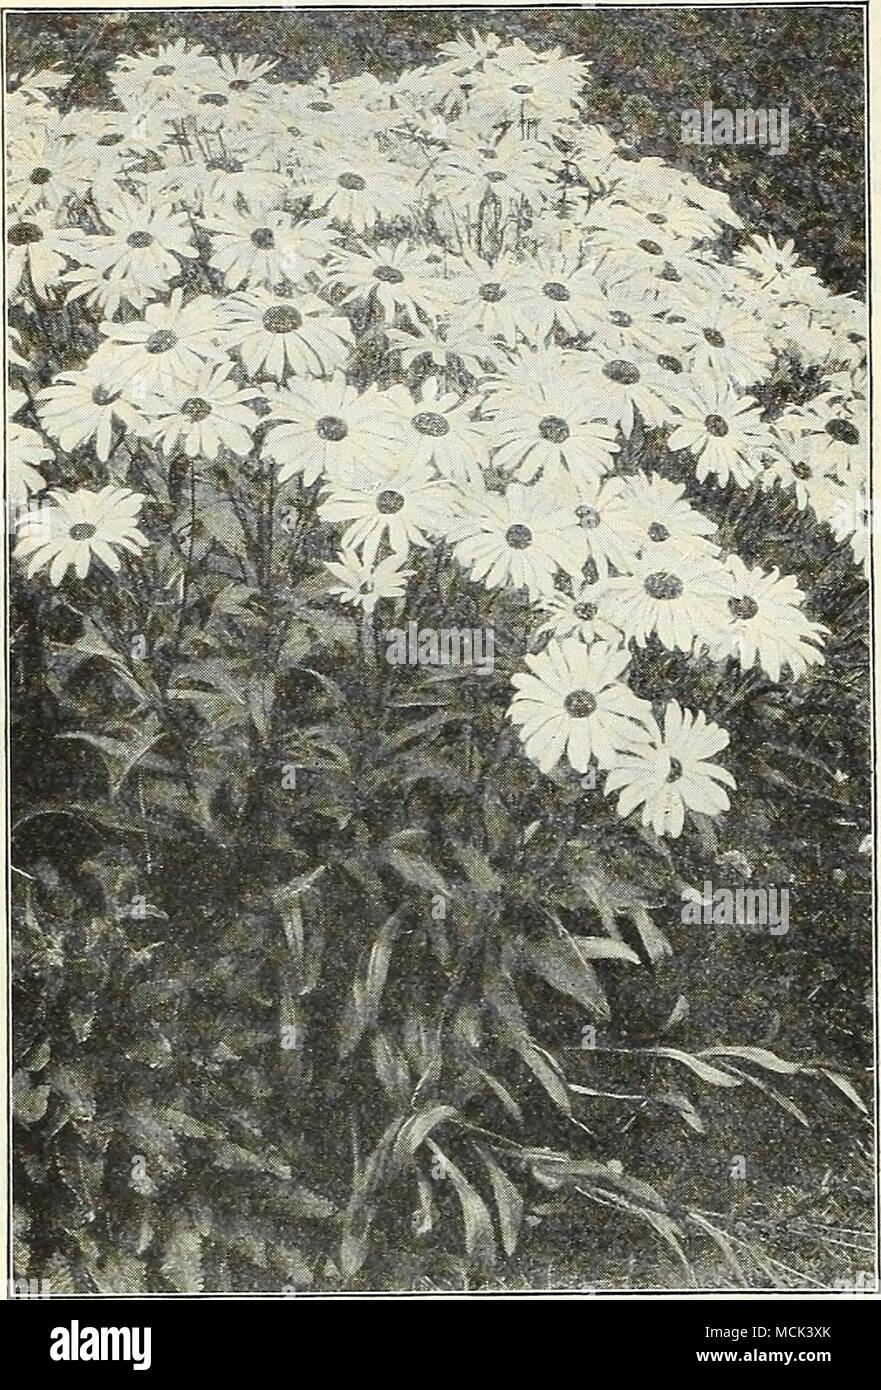 Shasta daisy aljvsk cerastium snow in suinmer pr pkt 1911 a very pretty dwarf white leaved edging plant bearing small white flowers hardy perennial so is cheiranthus aery pretty dwarf hardy mightylinksfo